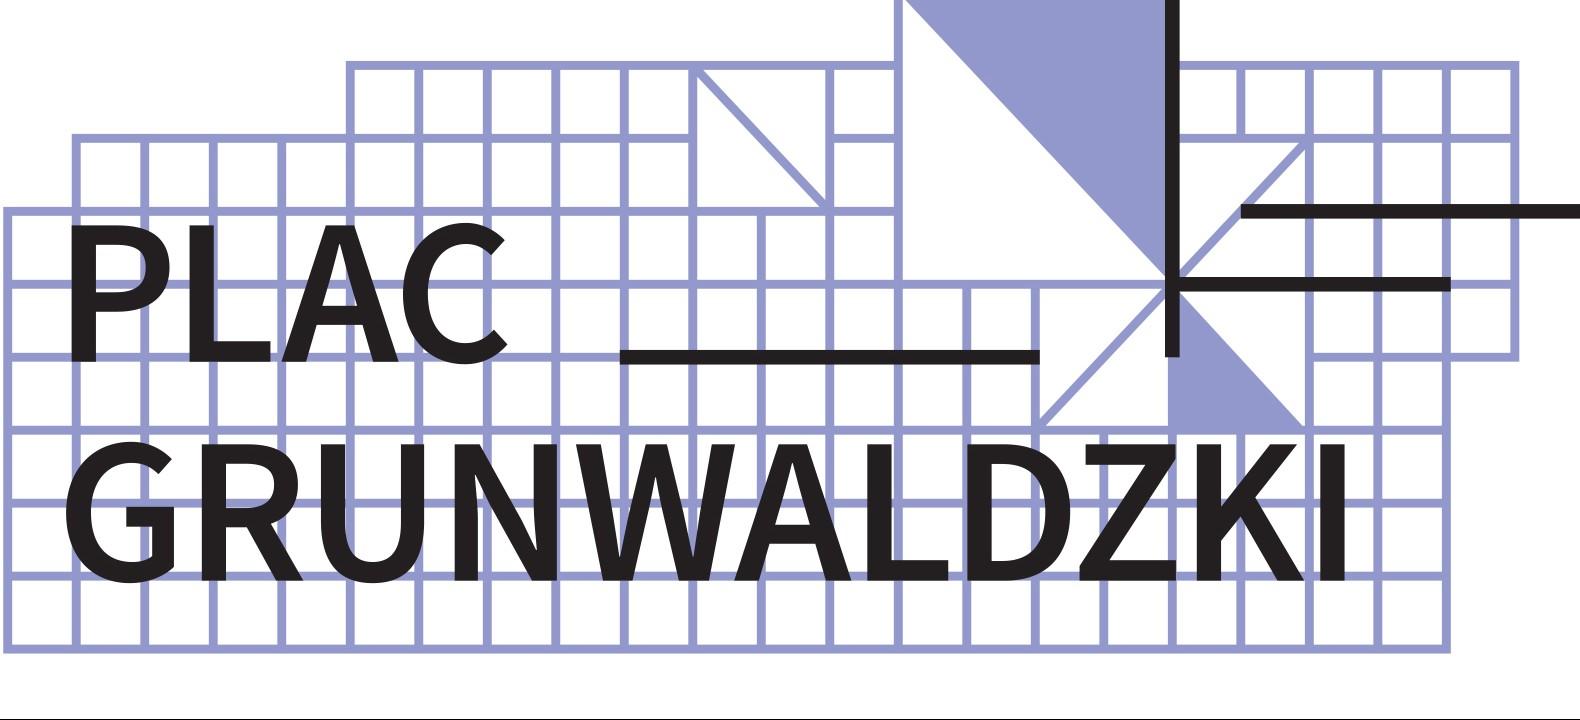 PLAC GRUNWALDZKI-1